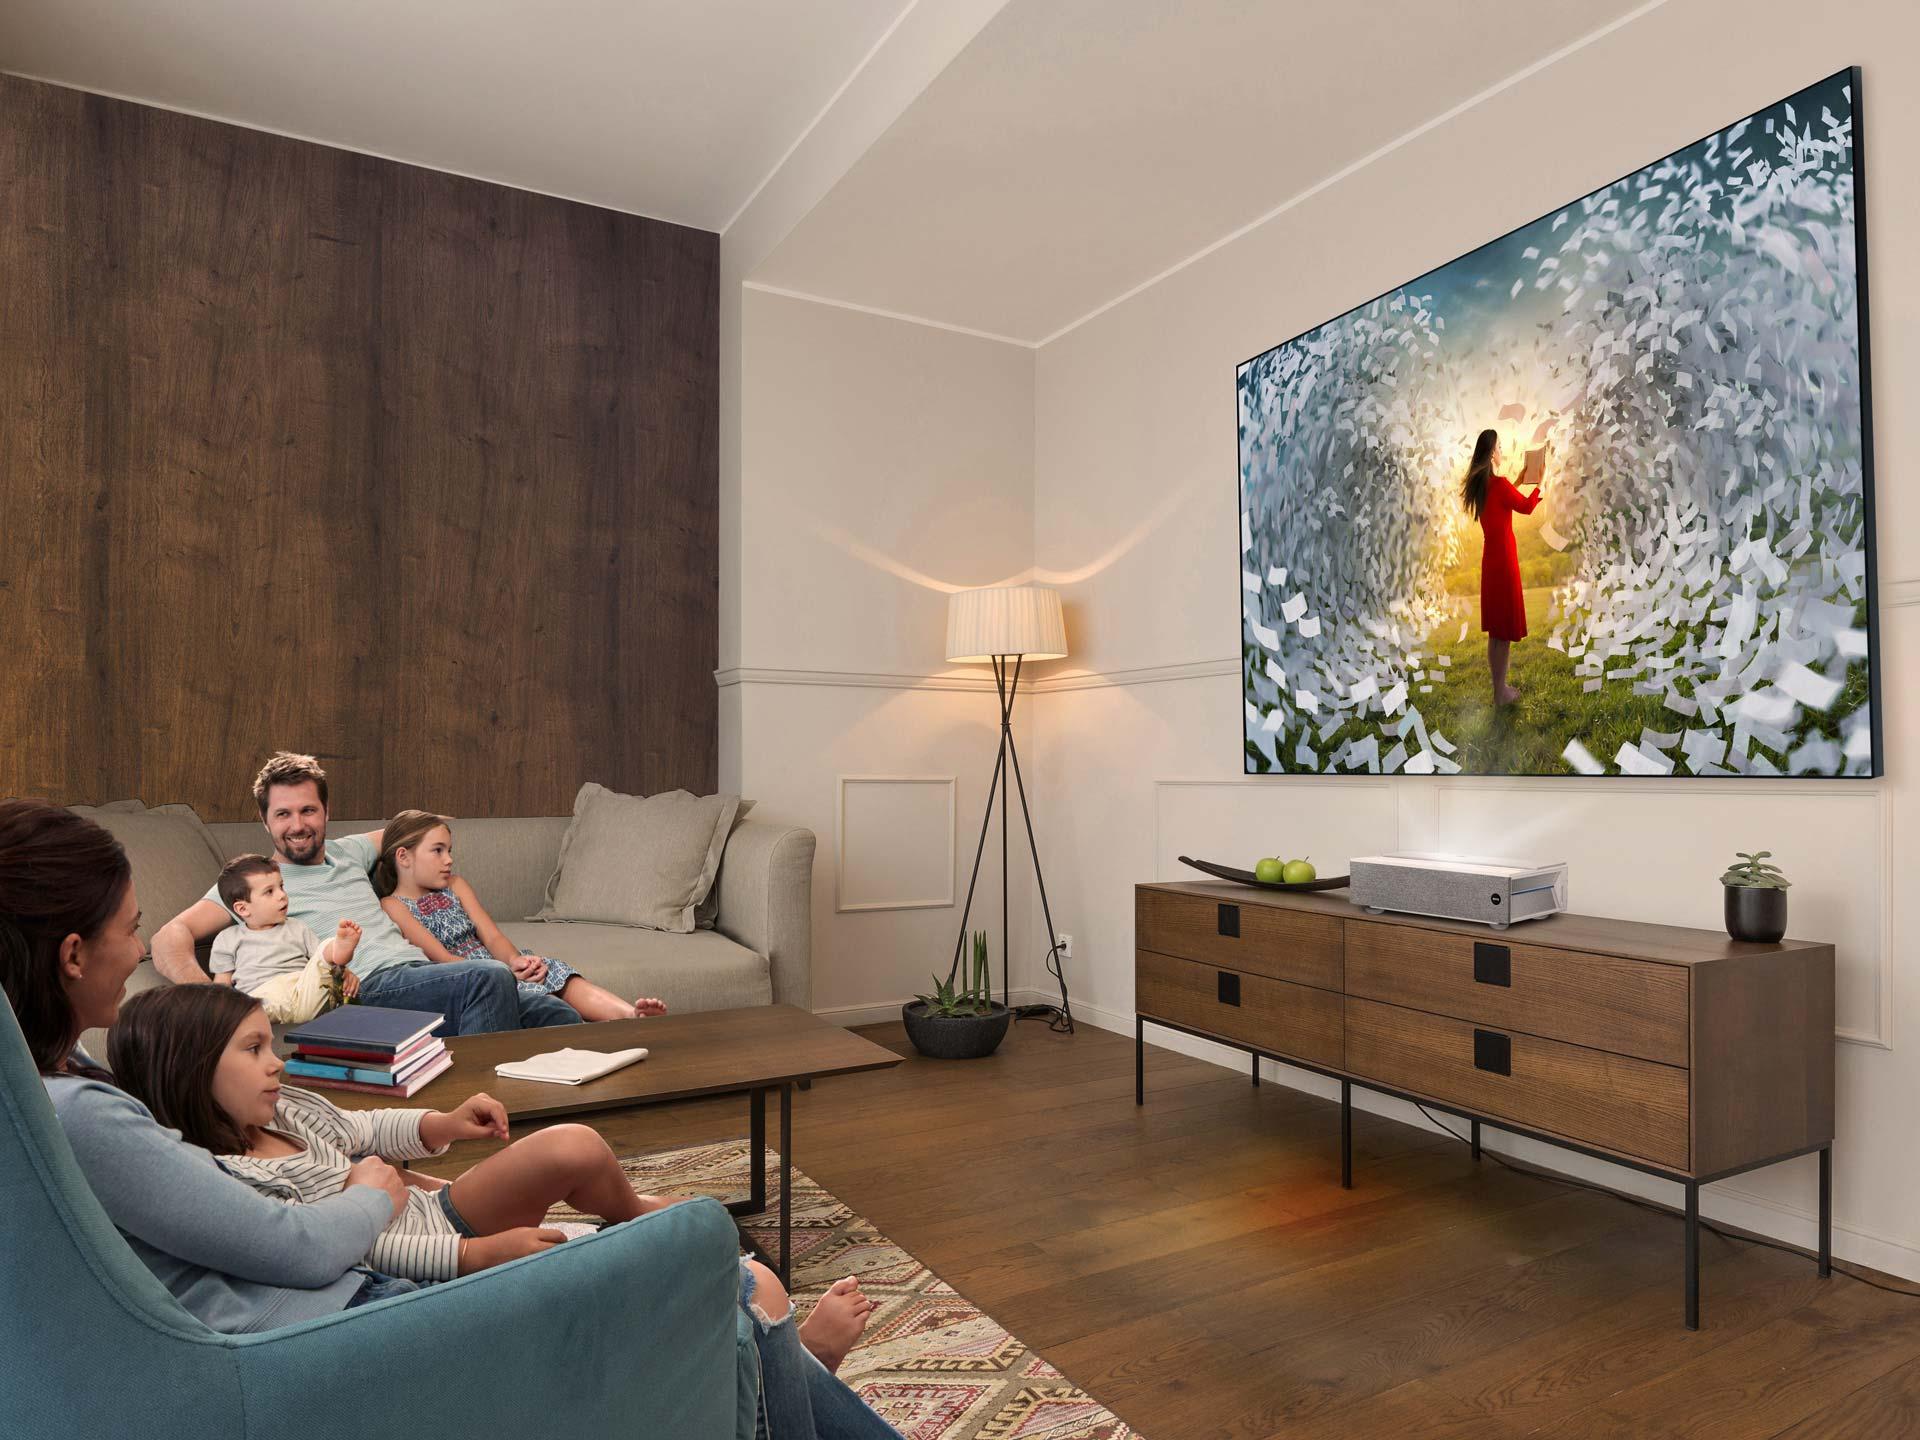 BenQ發表4K HDR 雷射電視 V6000 / V6050 優異產品設計,獲2020年iF產品設計獎殊榮 9/7~9/30早鳥預購價,不到10萬享受4K百吋大電視